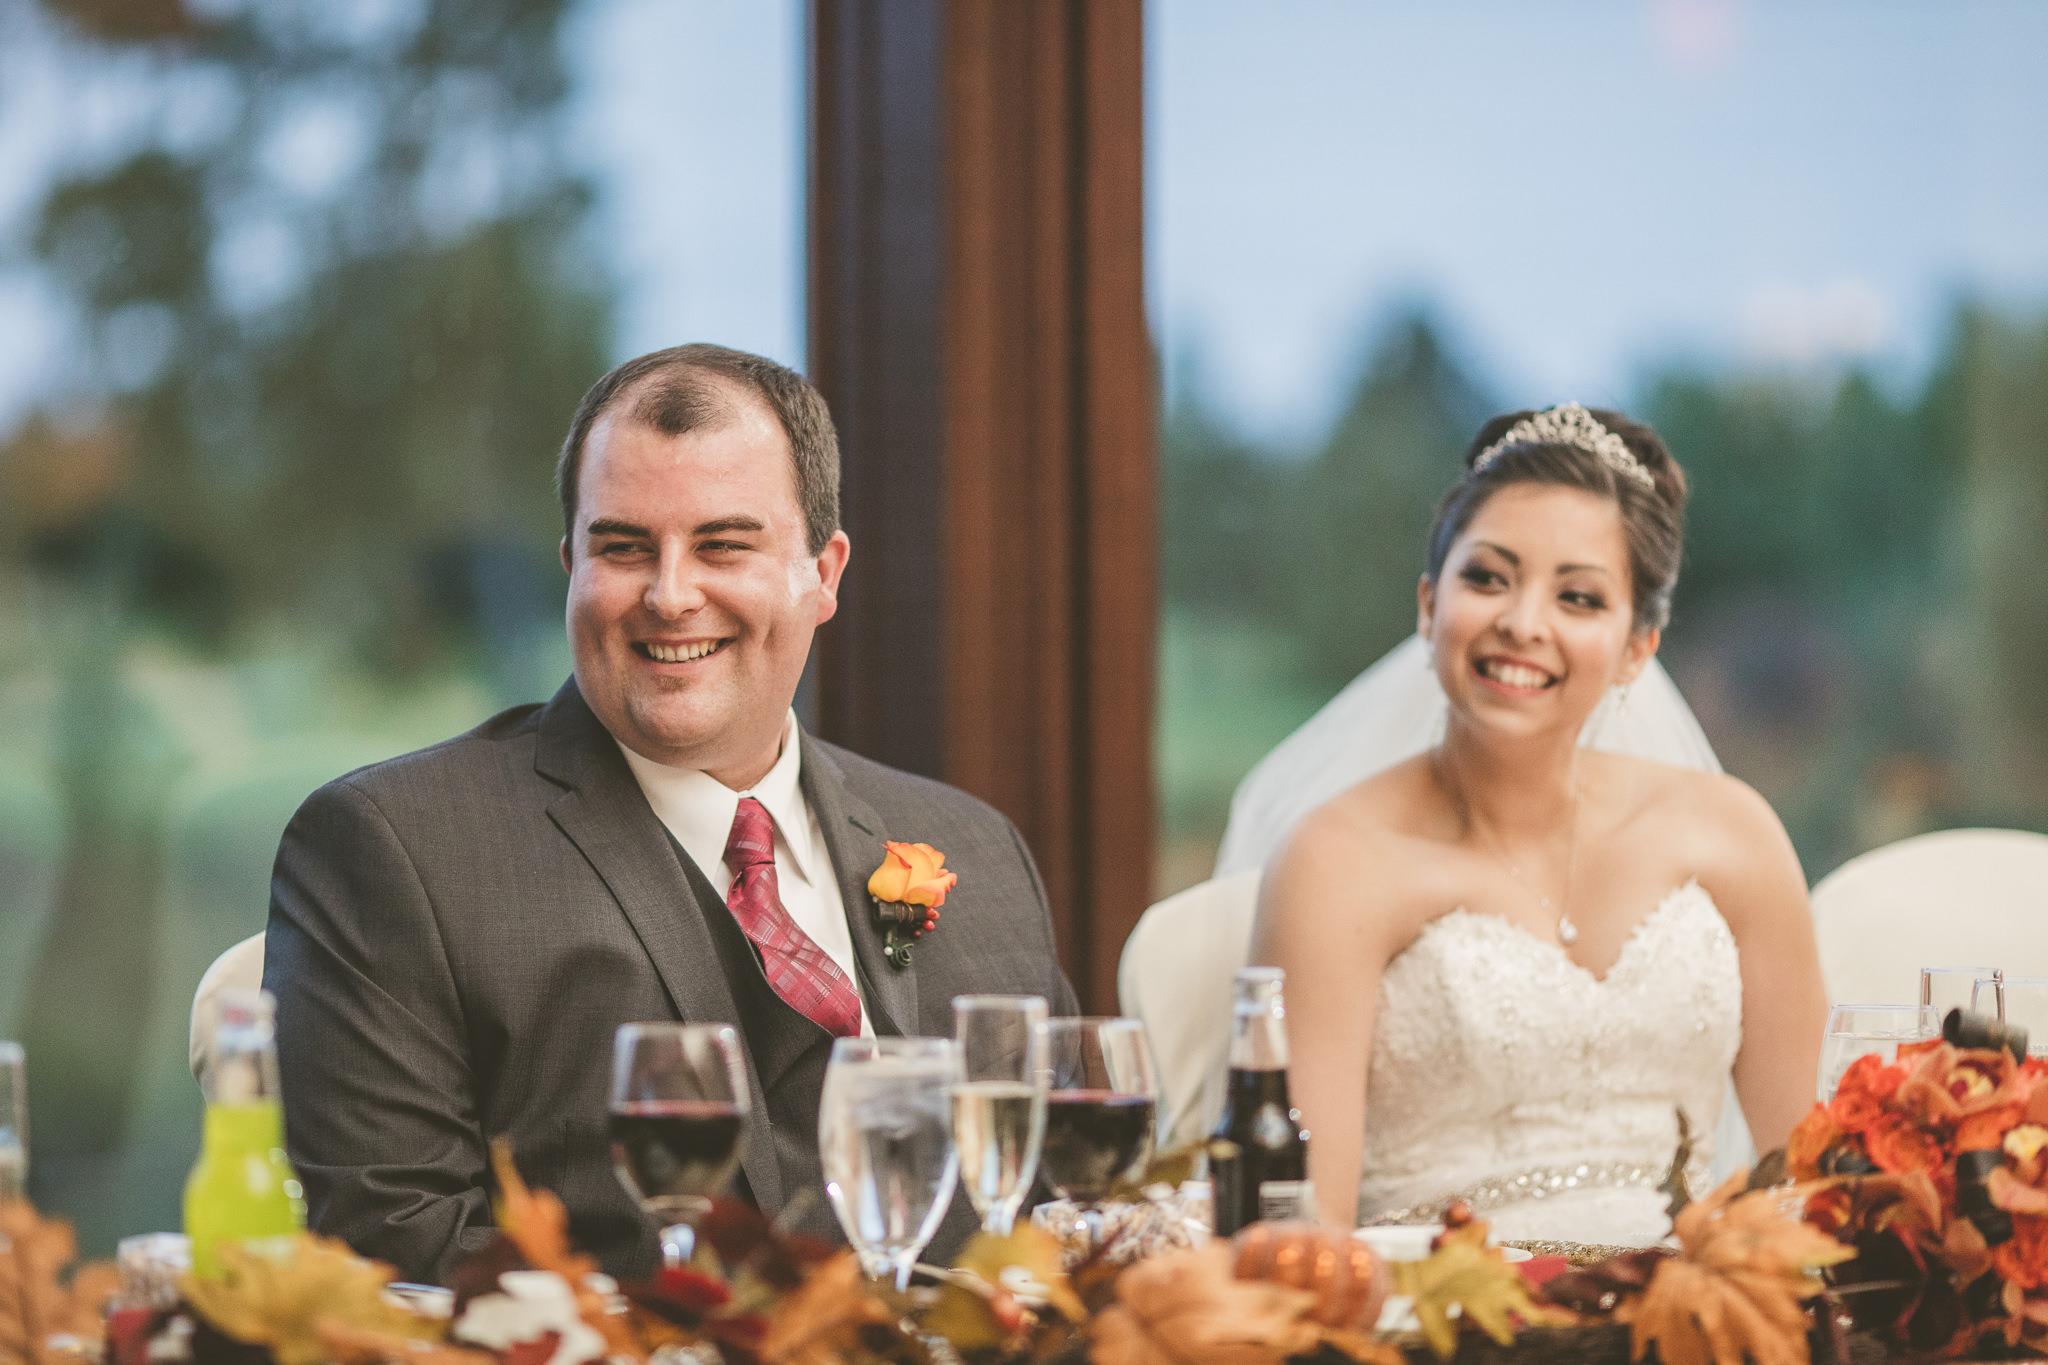 deer creek banquet facility wedding photos 679 - Deer Creek Wedding Photos